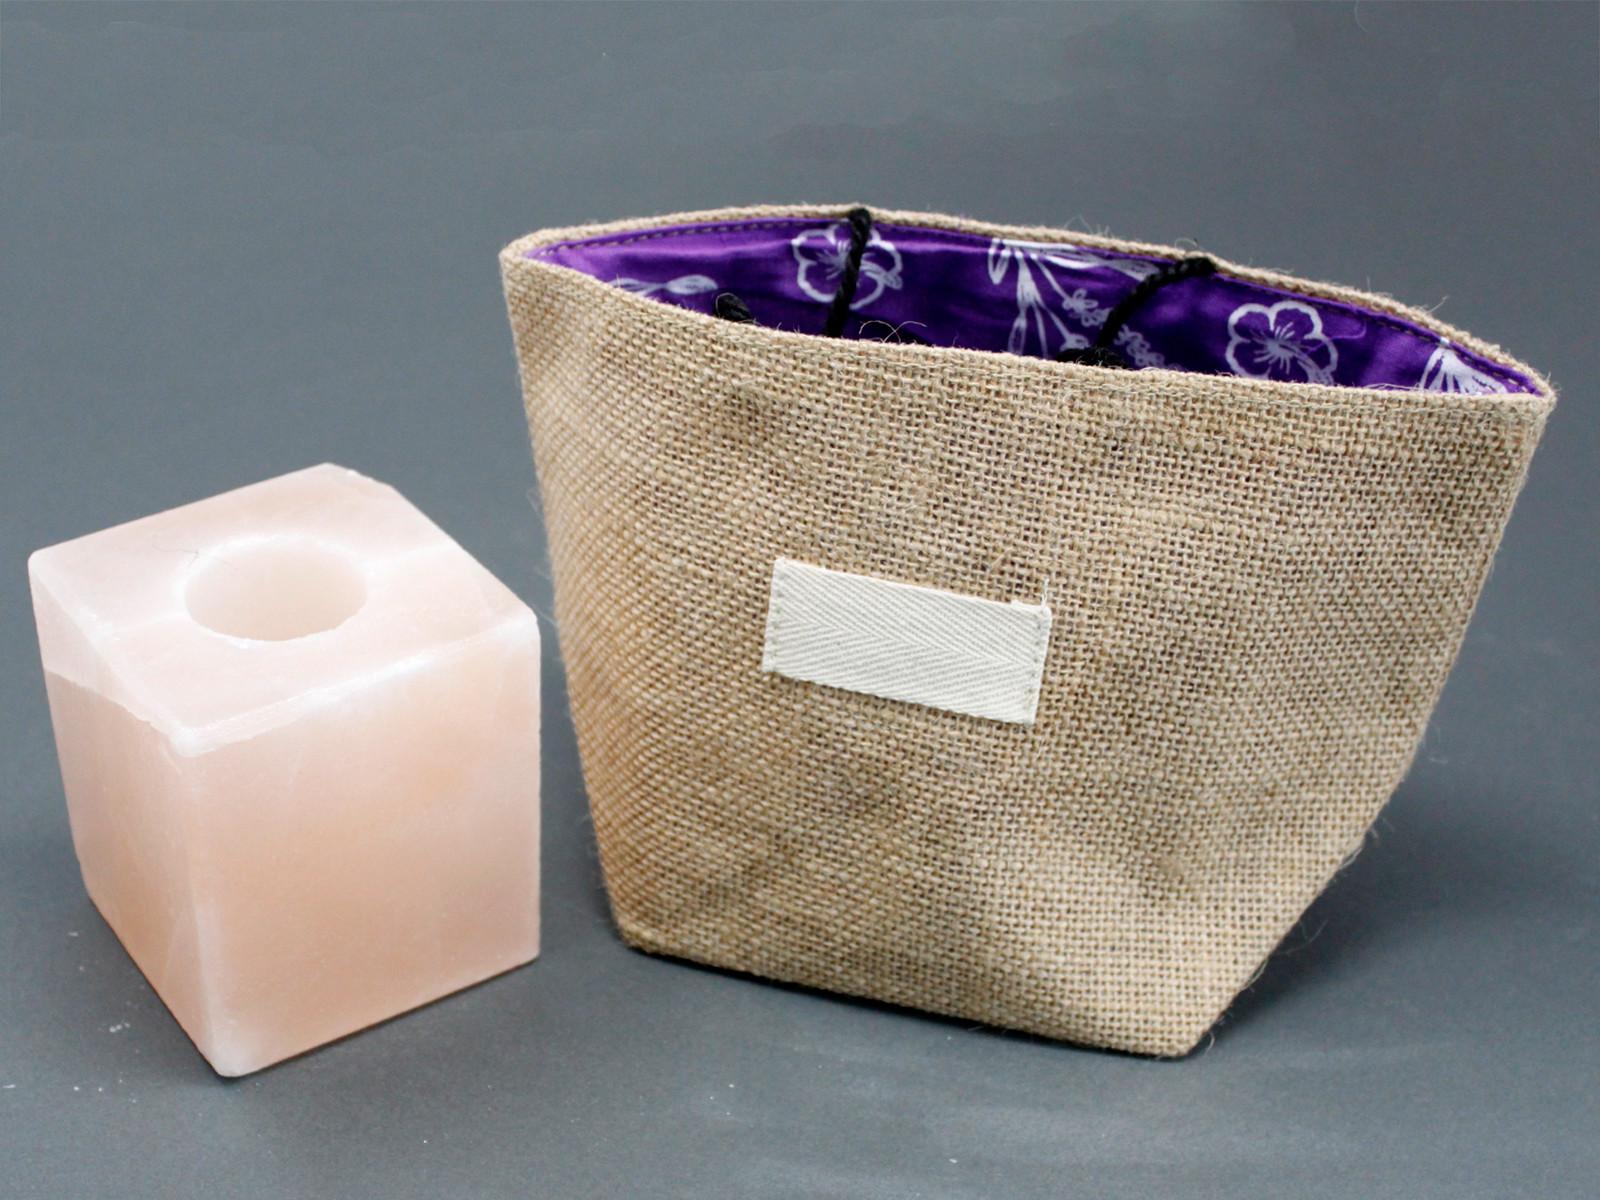 Natural Jute Cotton Gift Bag Lavender Lining Large